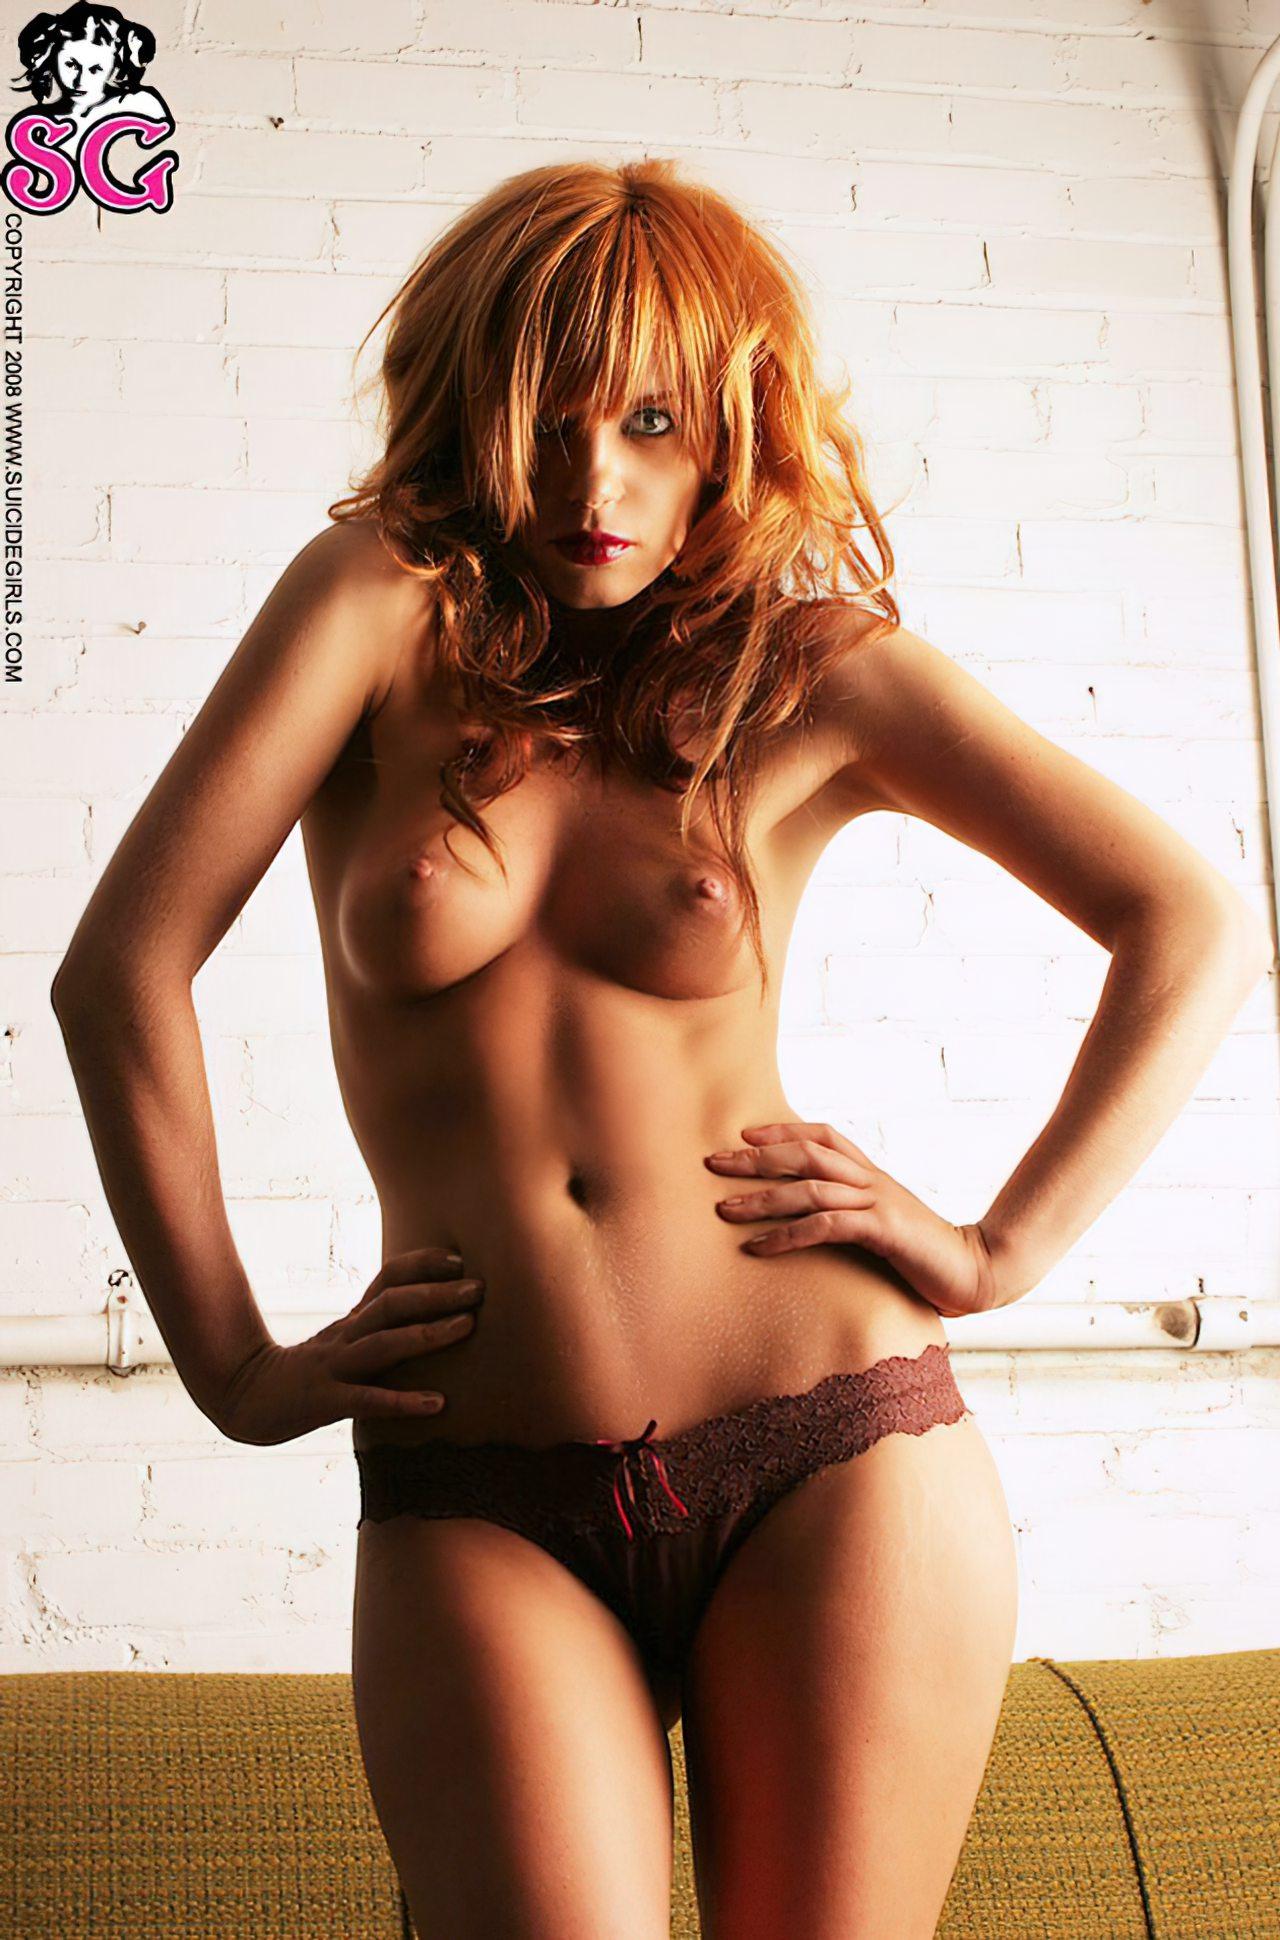 Ruiva Safada (44)